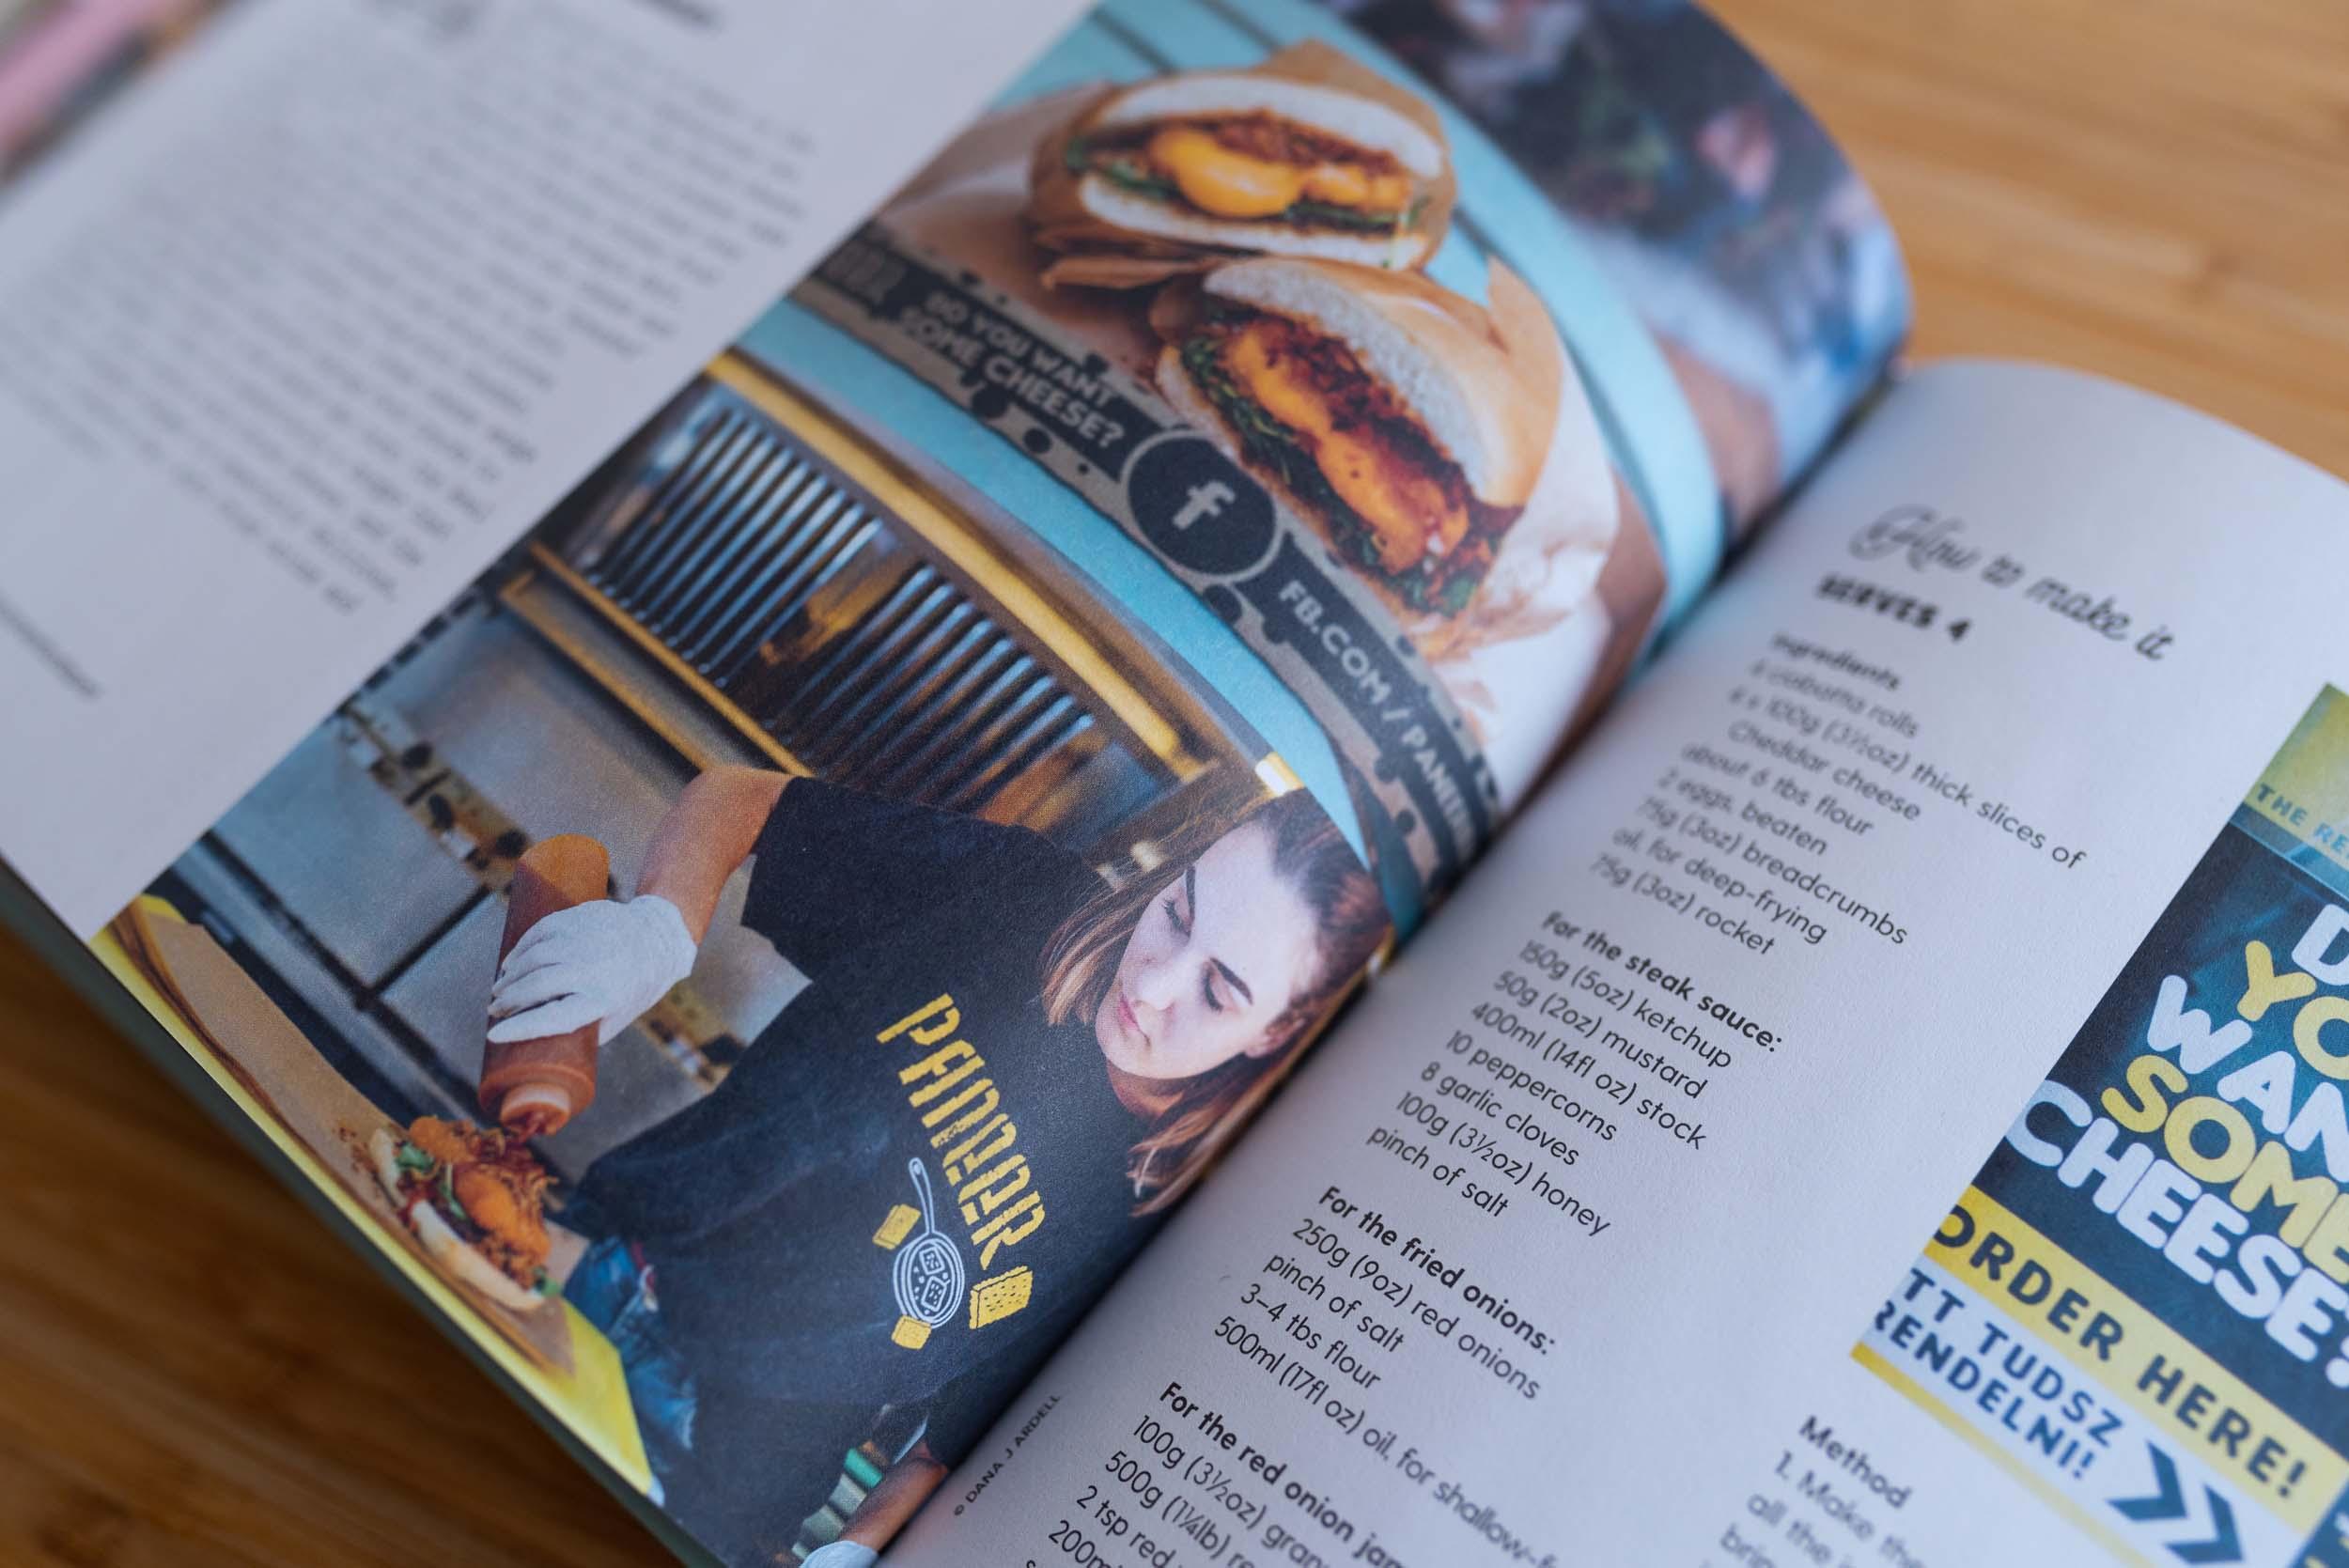 Budapest food photographer